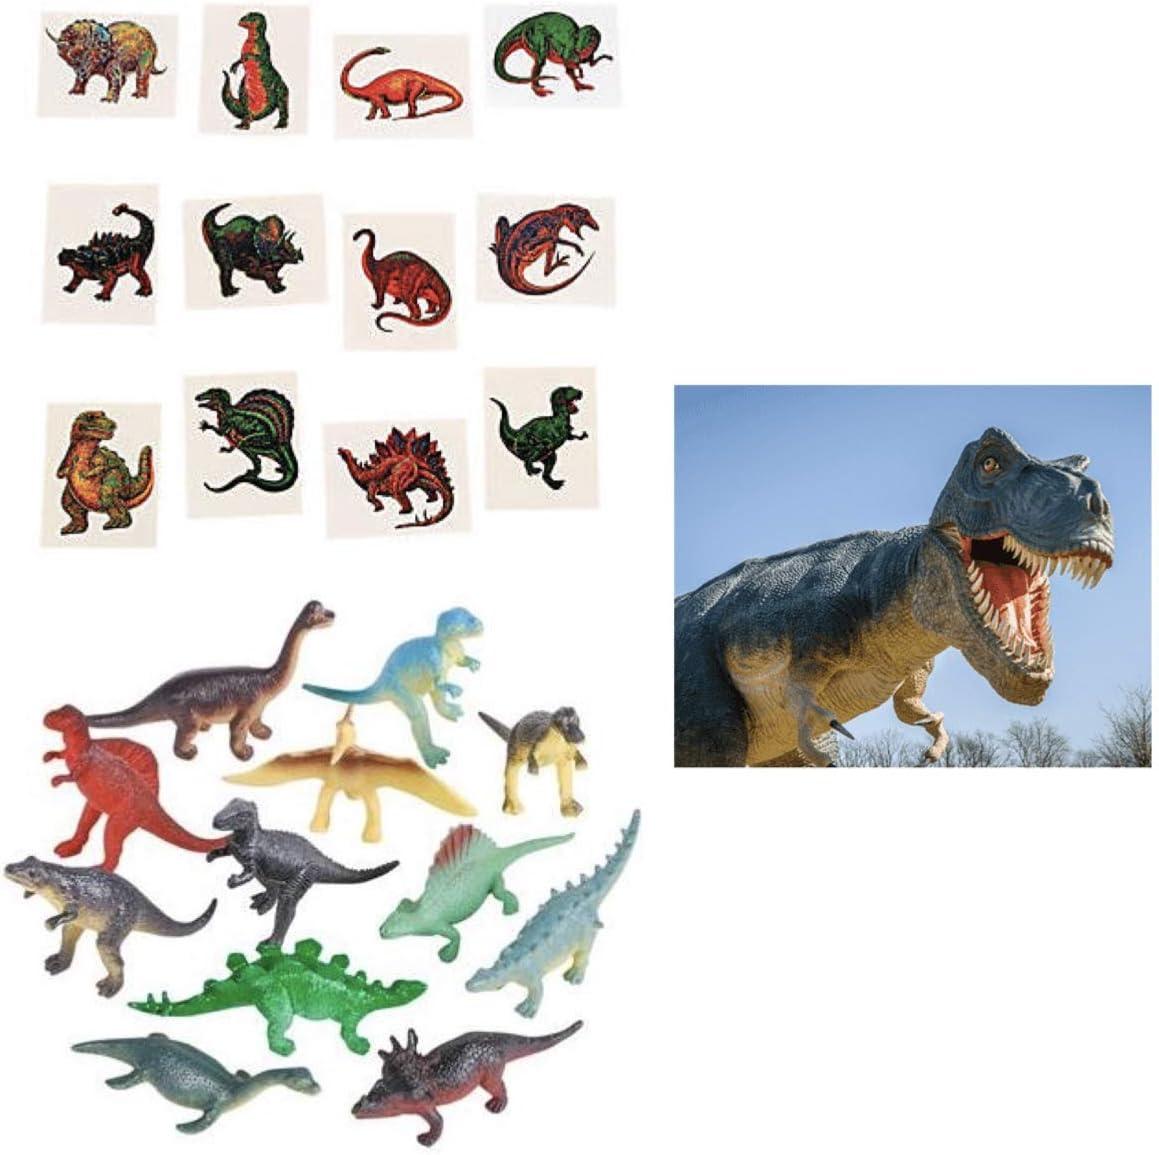 120 Dinosaur Party Favors - 72 Tattoos - 24 Mini Figures & 24 Stickers - Teacher Classroom Reward Incentive School Supplies Jurassic Prehistoric T-Rex Steg